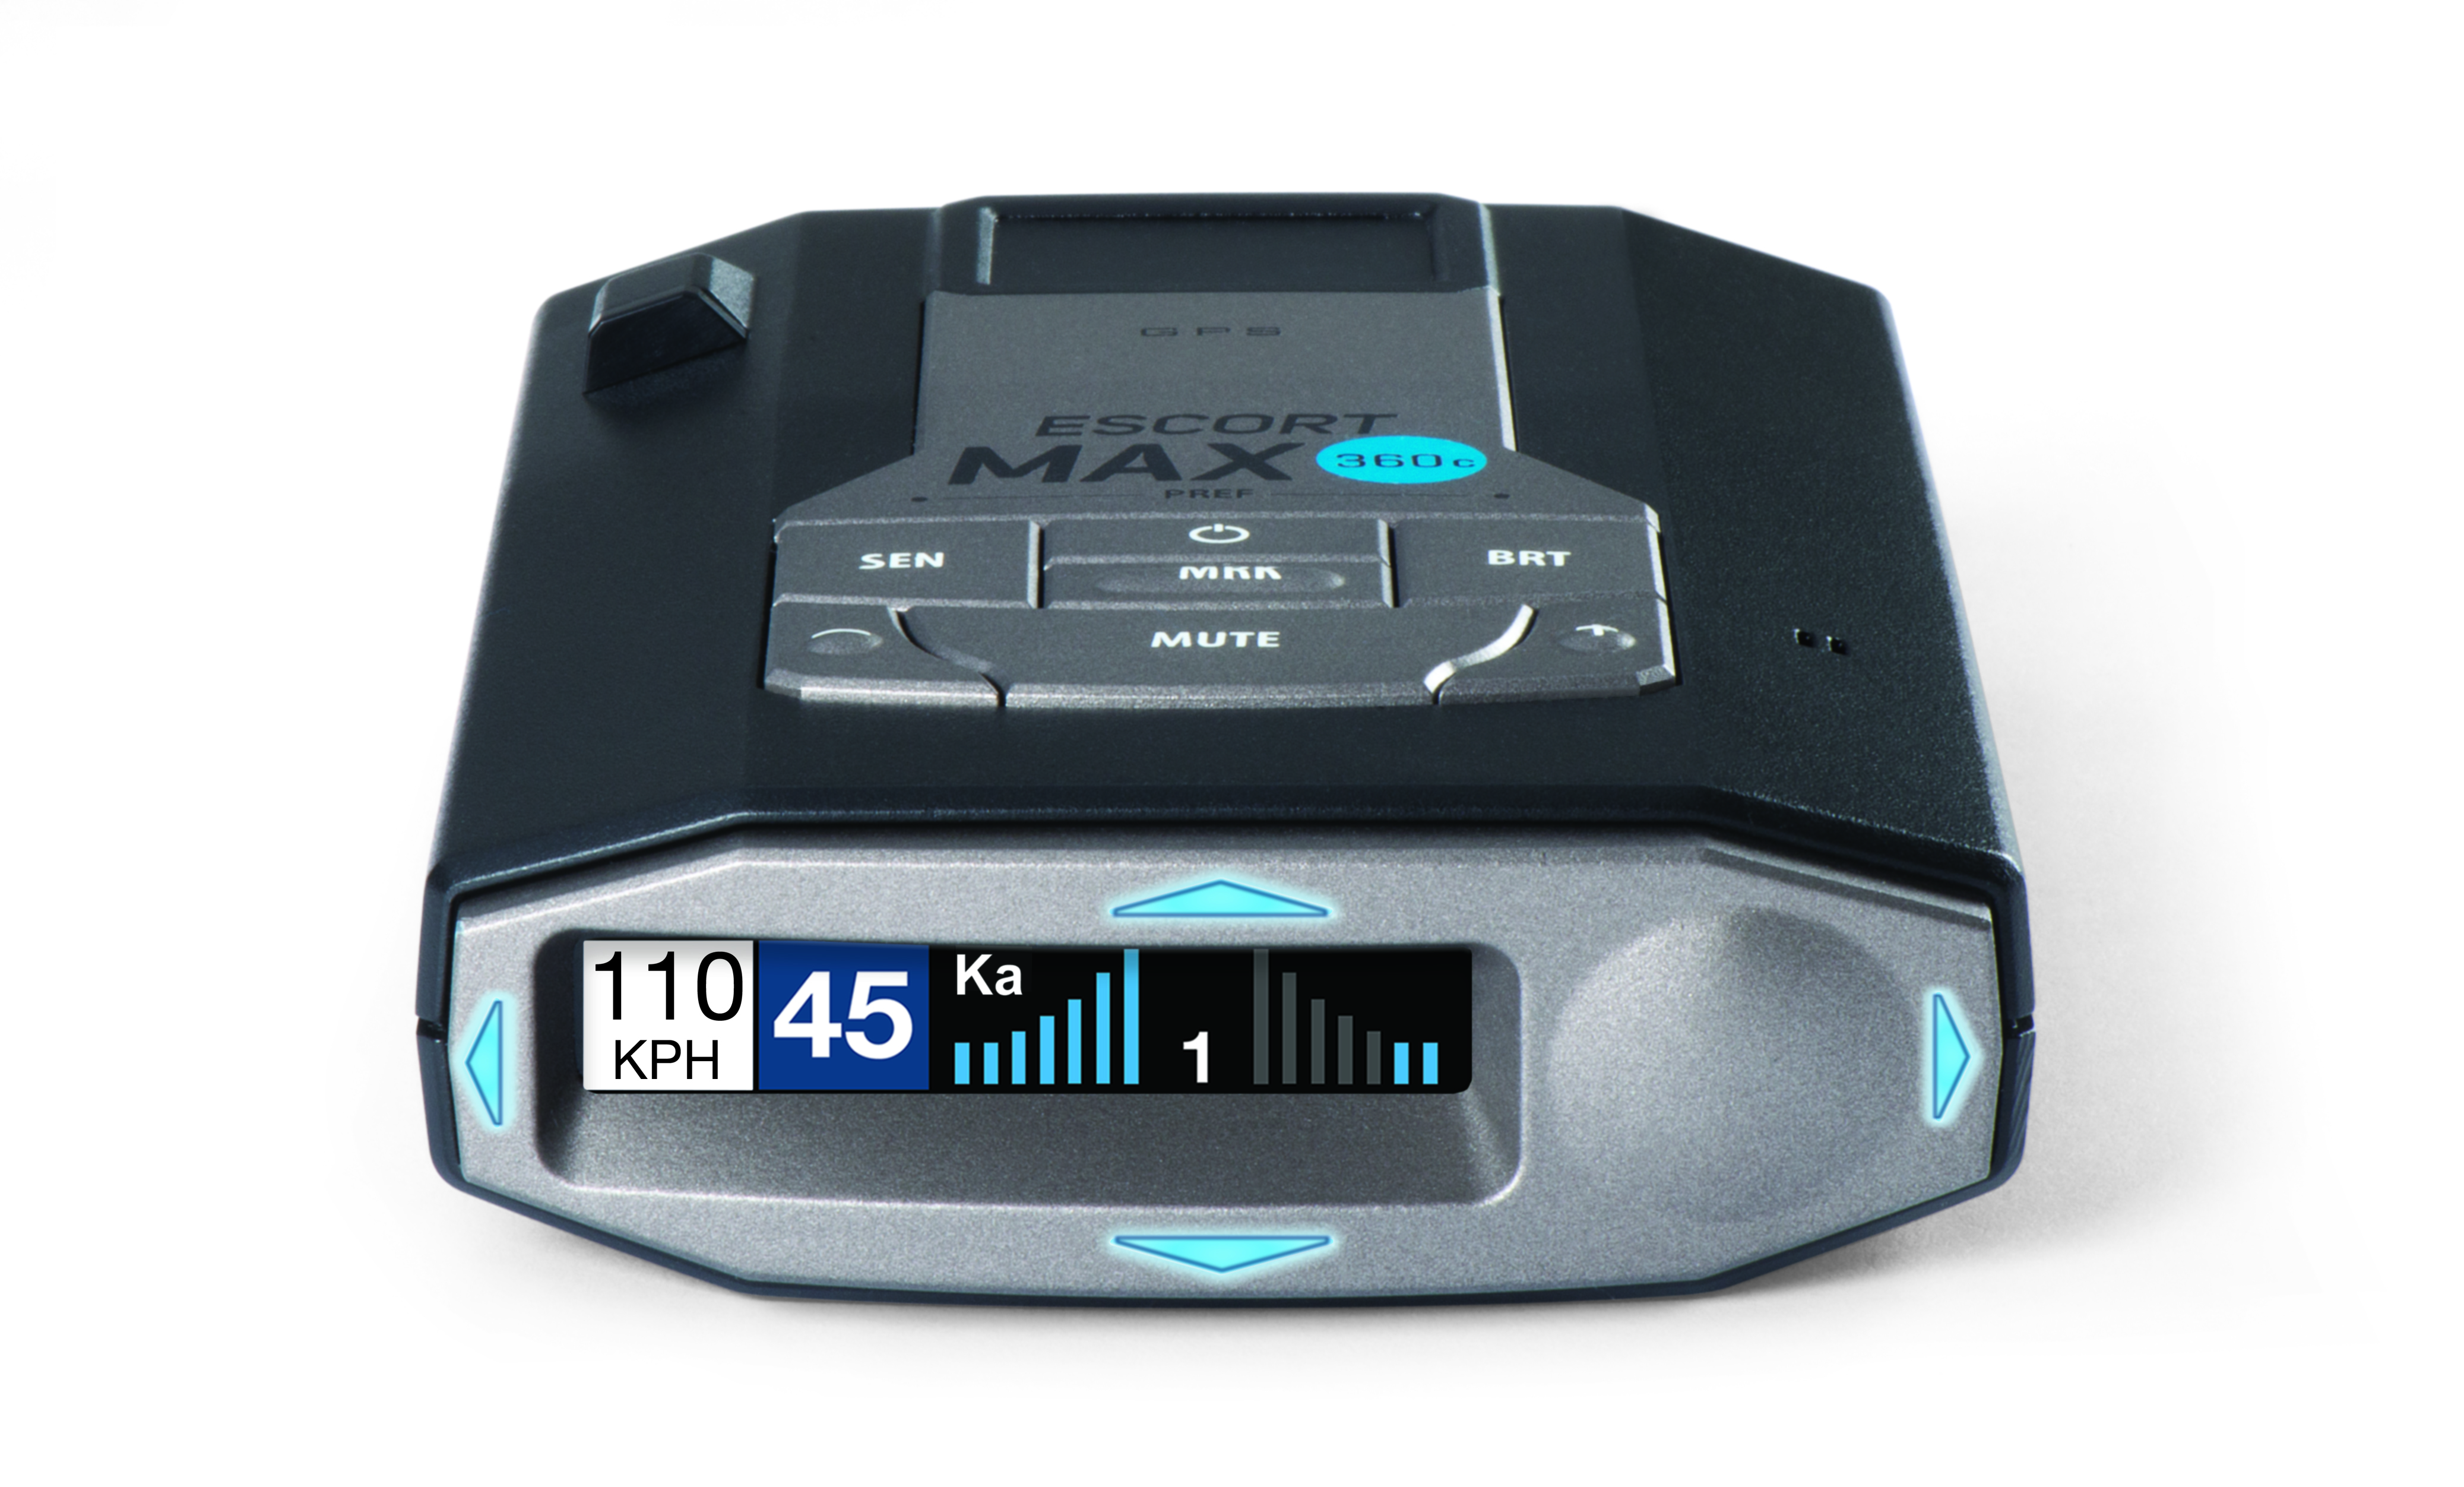 Escort Radar Max 360 >> Escort MAX 360c International | Beltronics